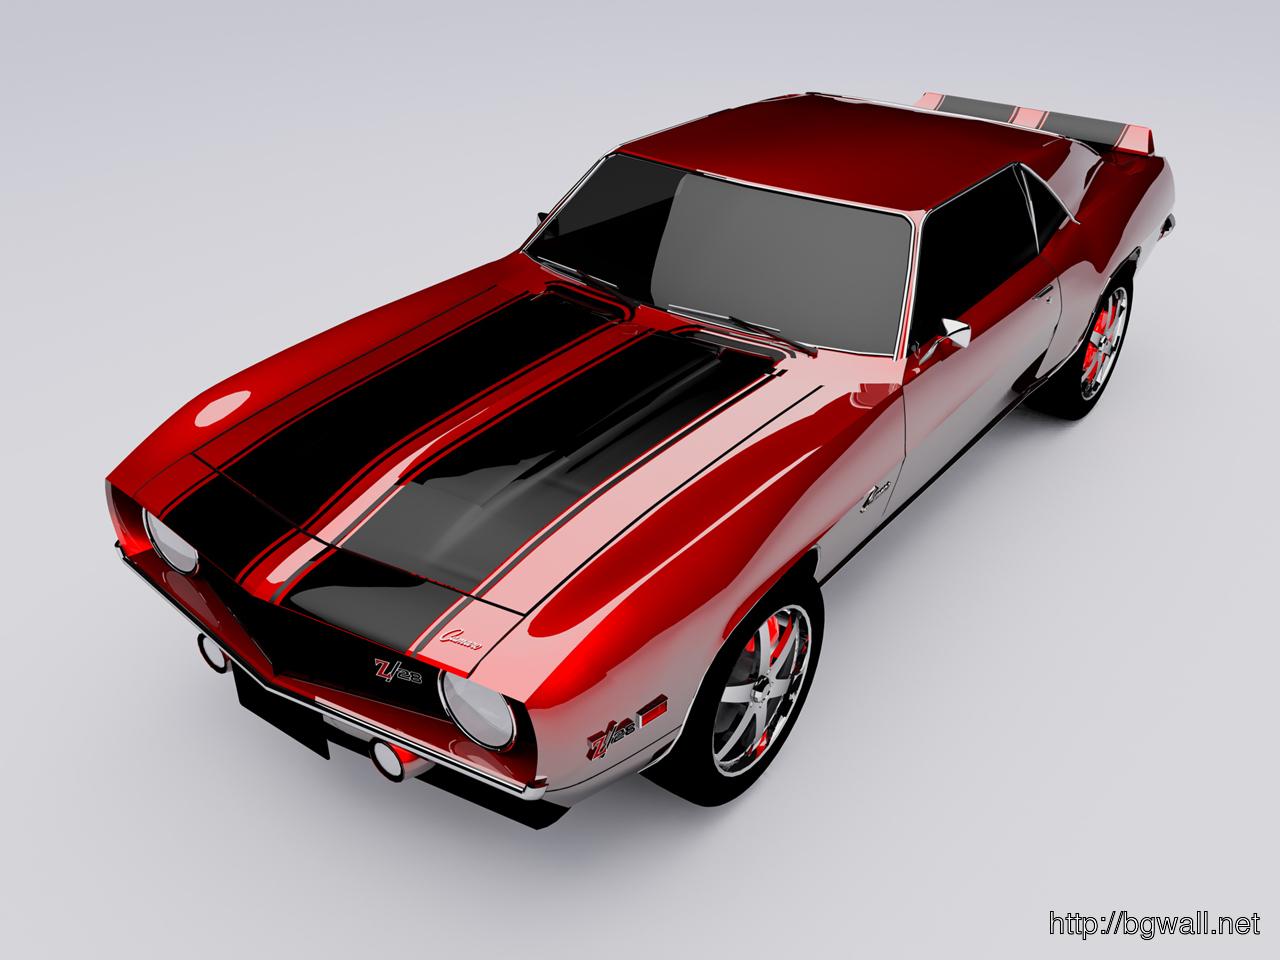 Chevy-Camaro-1969-HD-Wallpaper